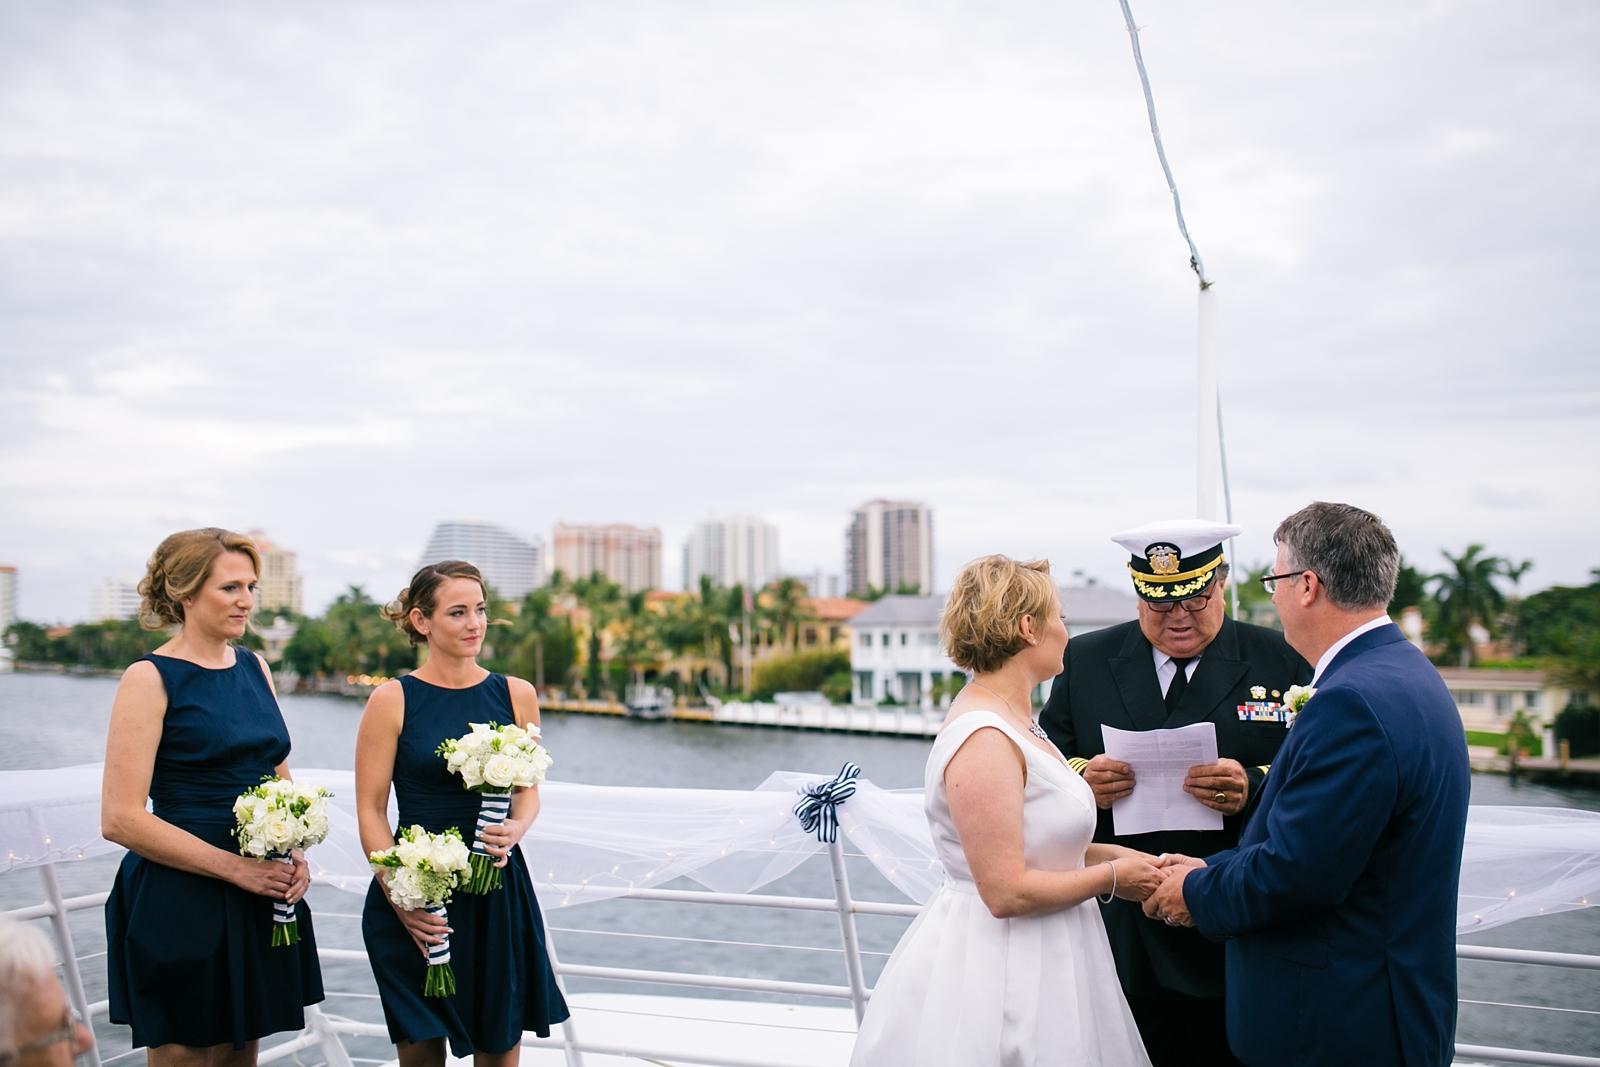 46-los-angeles-wedding-photographer-fort-lauderdale.jpg